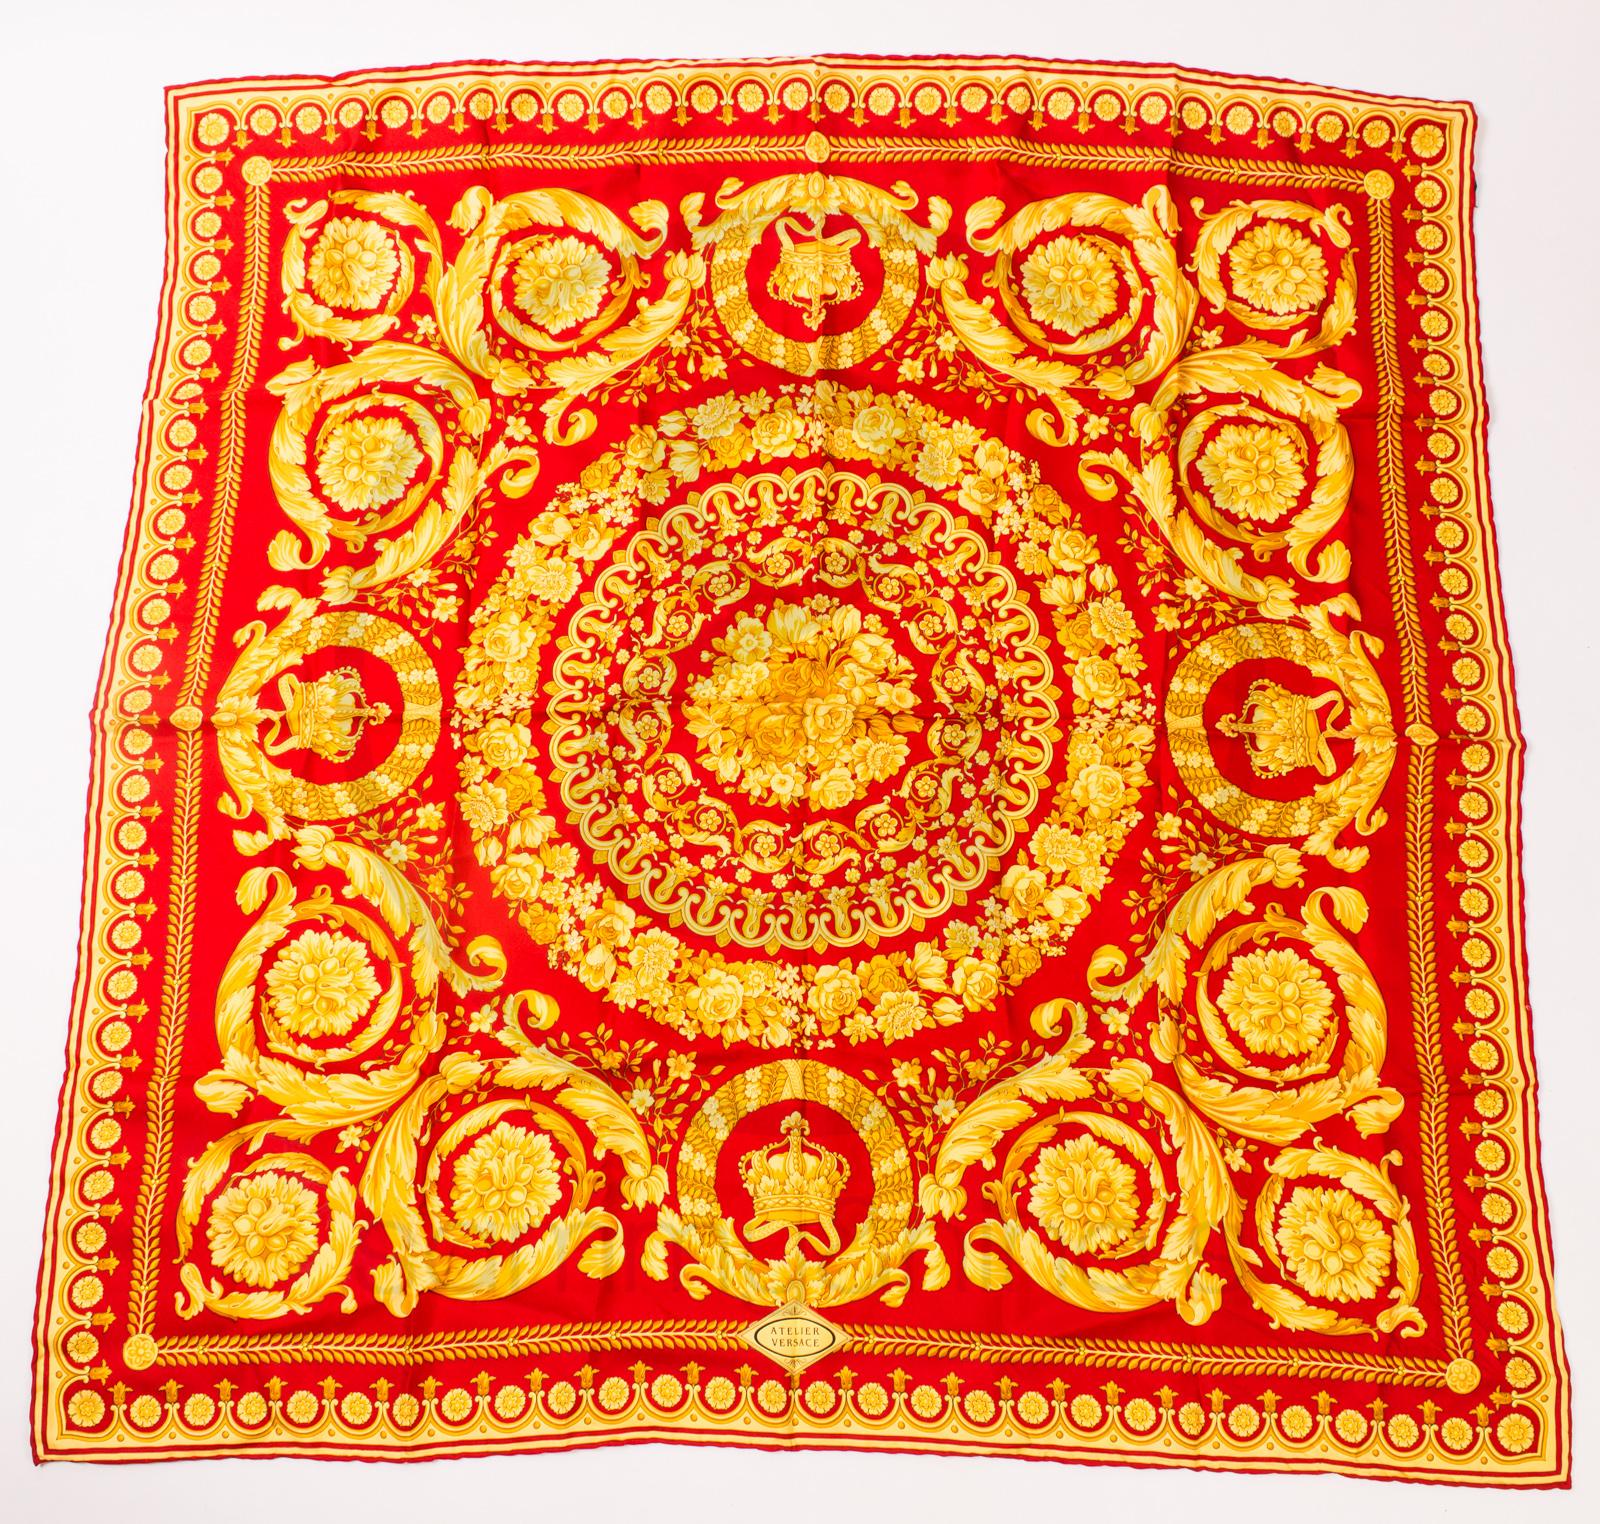 096b2409cb0e Gianni Versace silk foulard scarf – Sammy   Nino s Store